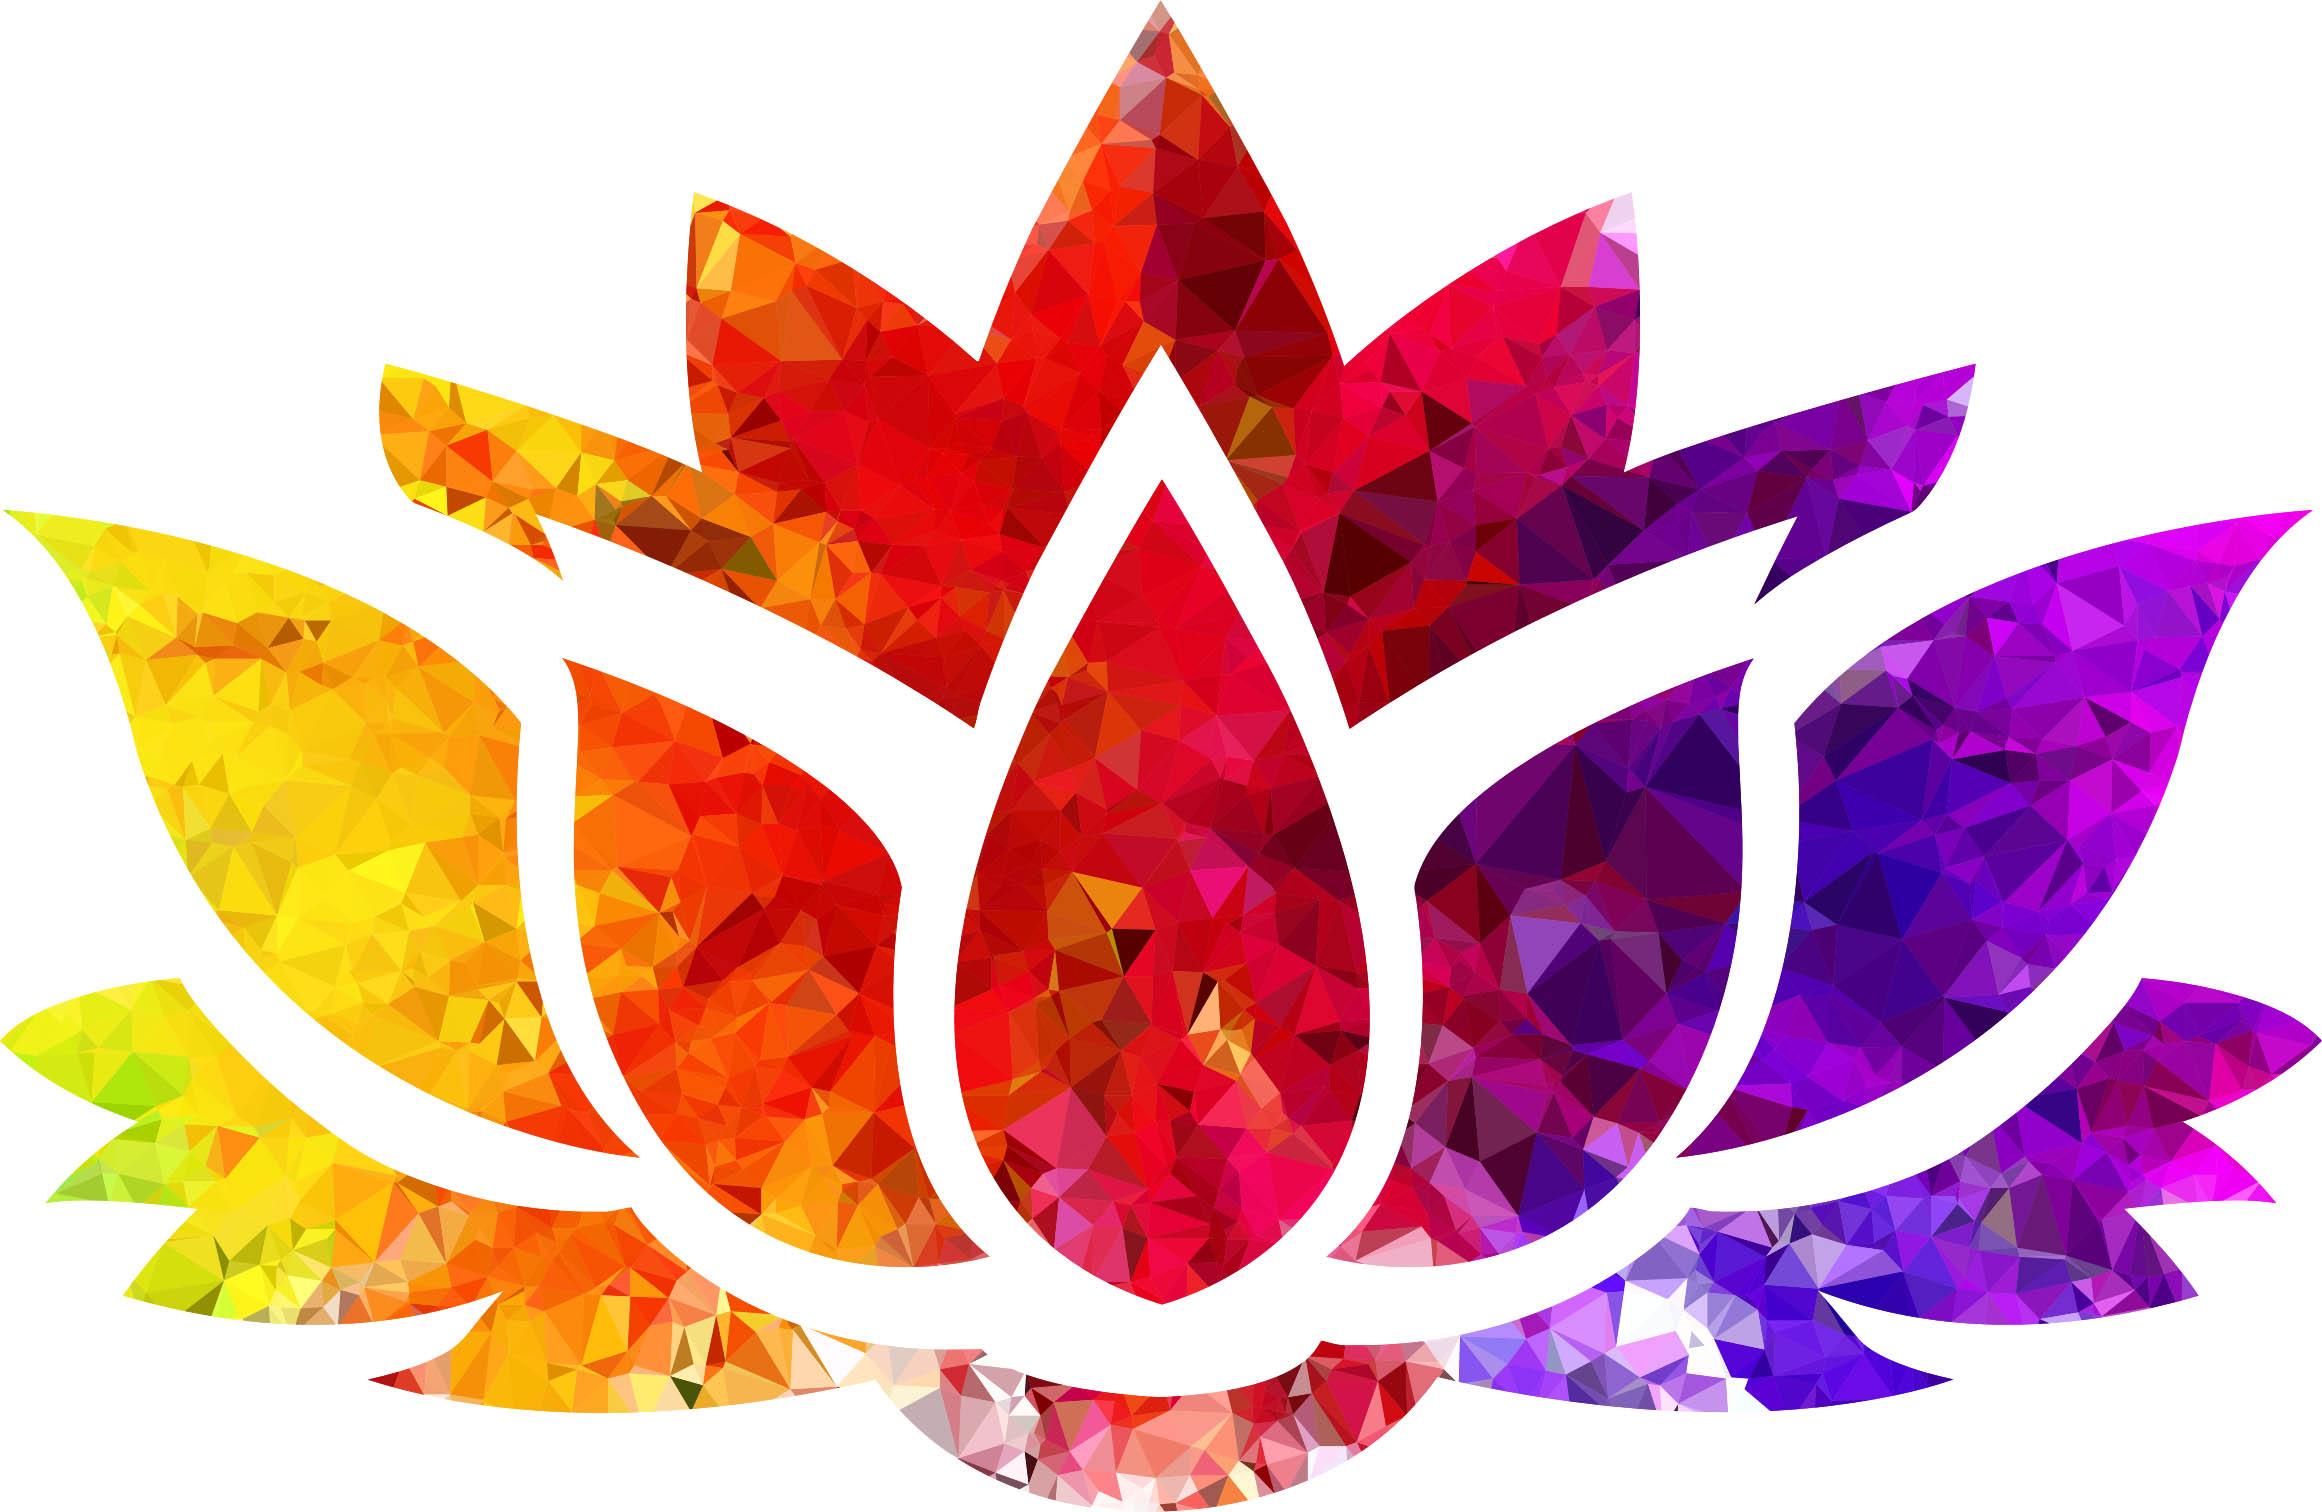 Topaz Ruby Sapphire Lotus Flower Silhouette Copy Icaad